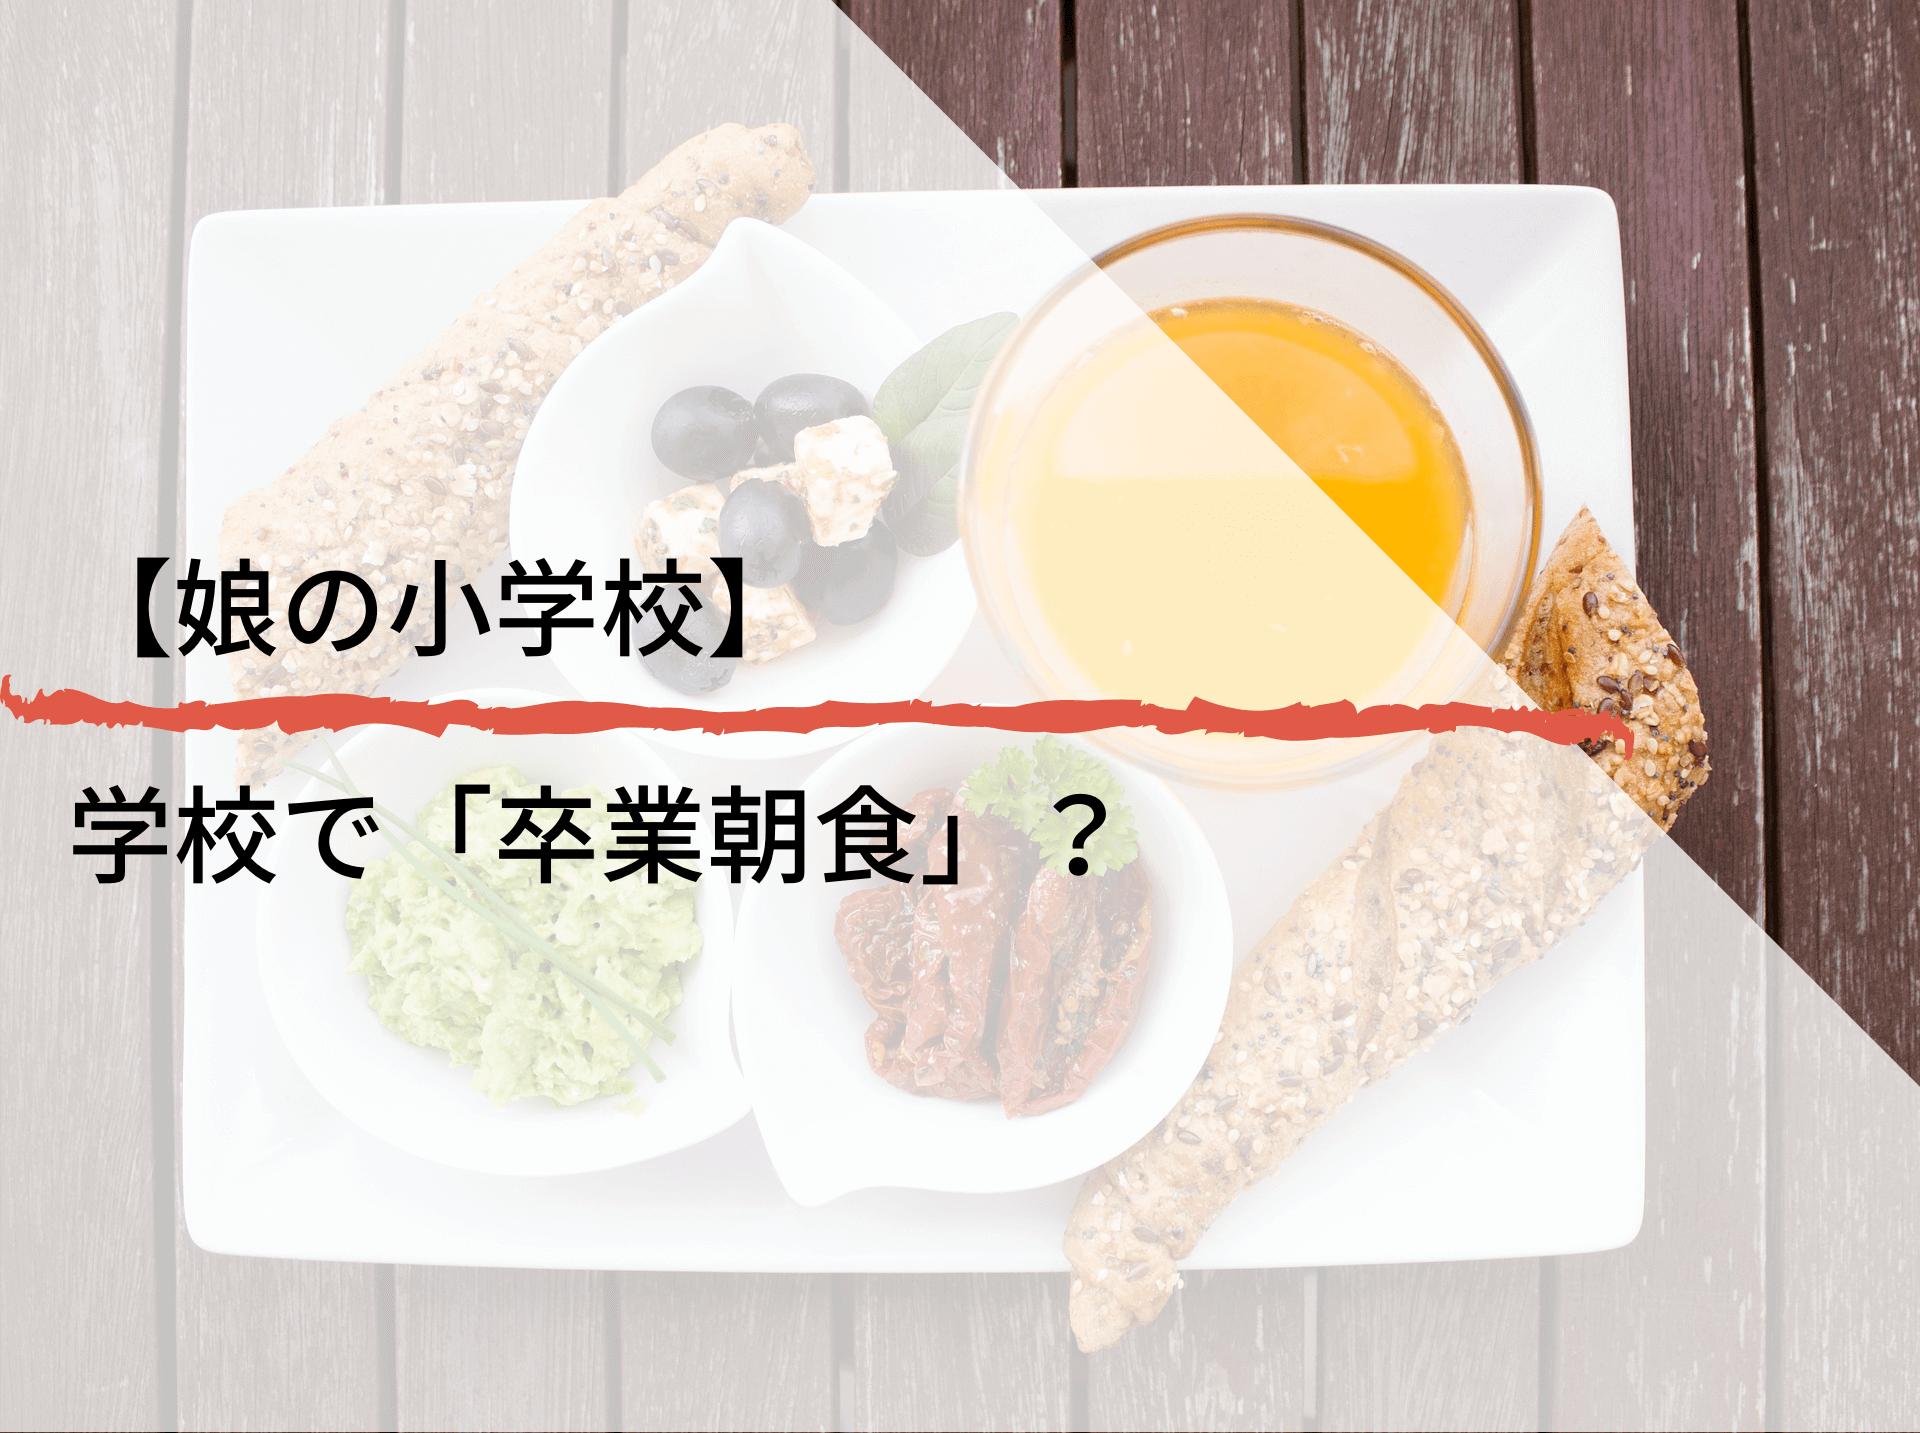 【娘の小学校】 学校で「卒業朝食」? (1)